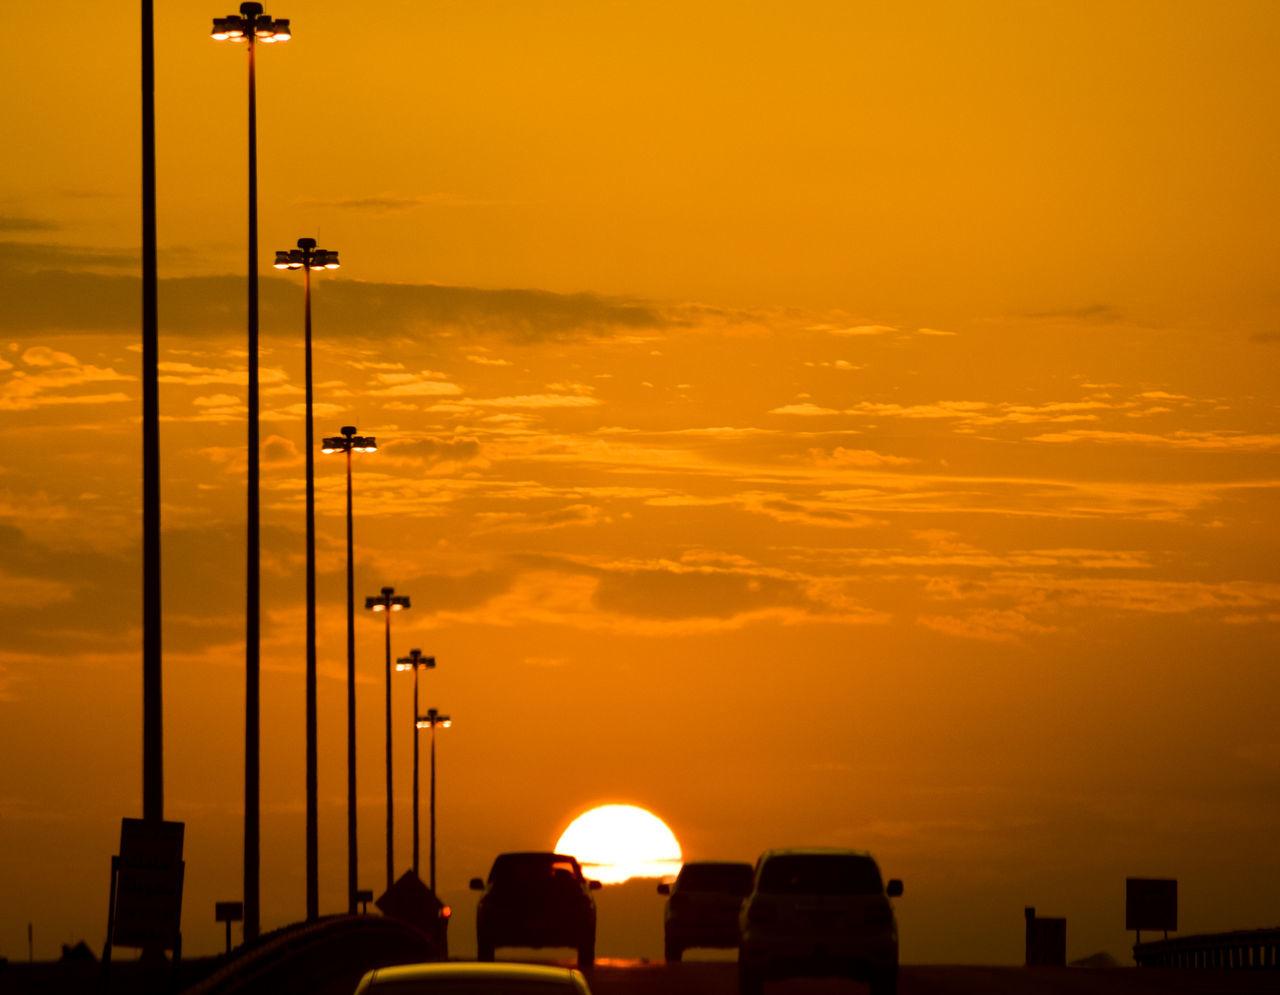 sunset, orange color, sky, cloud - sky, silhouette, nature, sun, beauty in nature, outdoors, transportation, no people, scenics, architecture